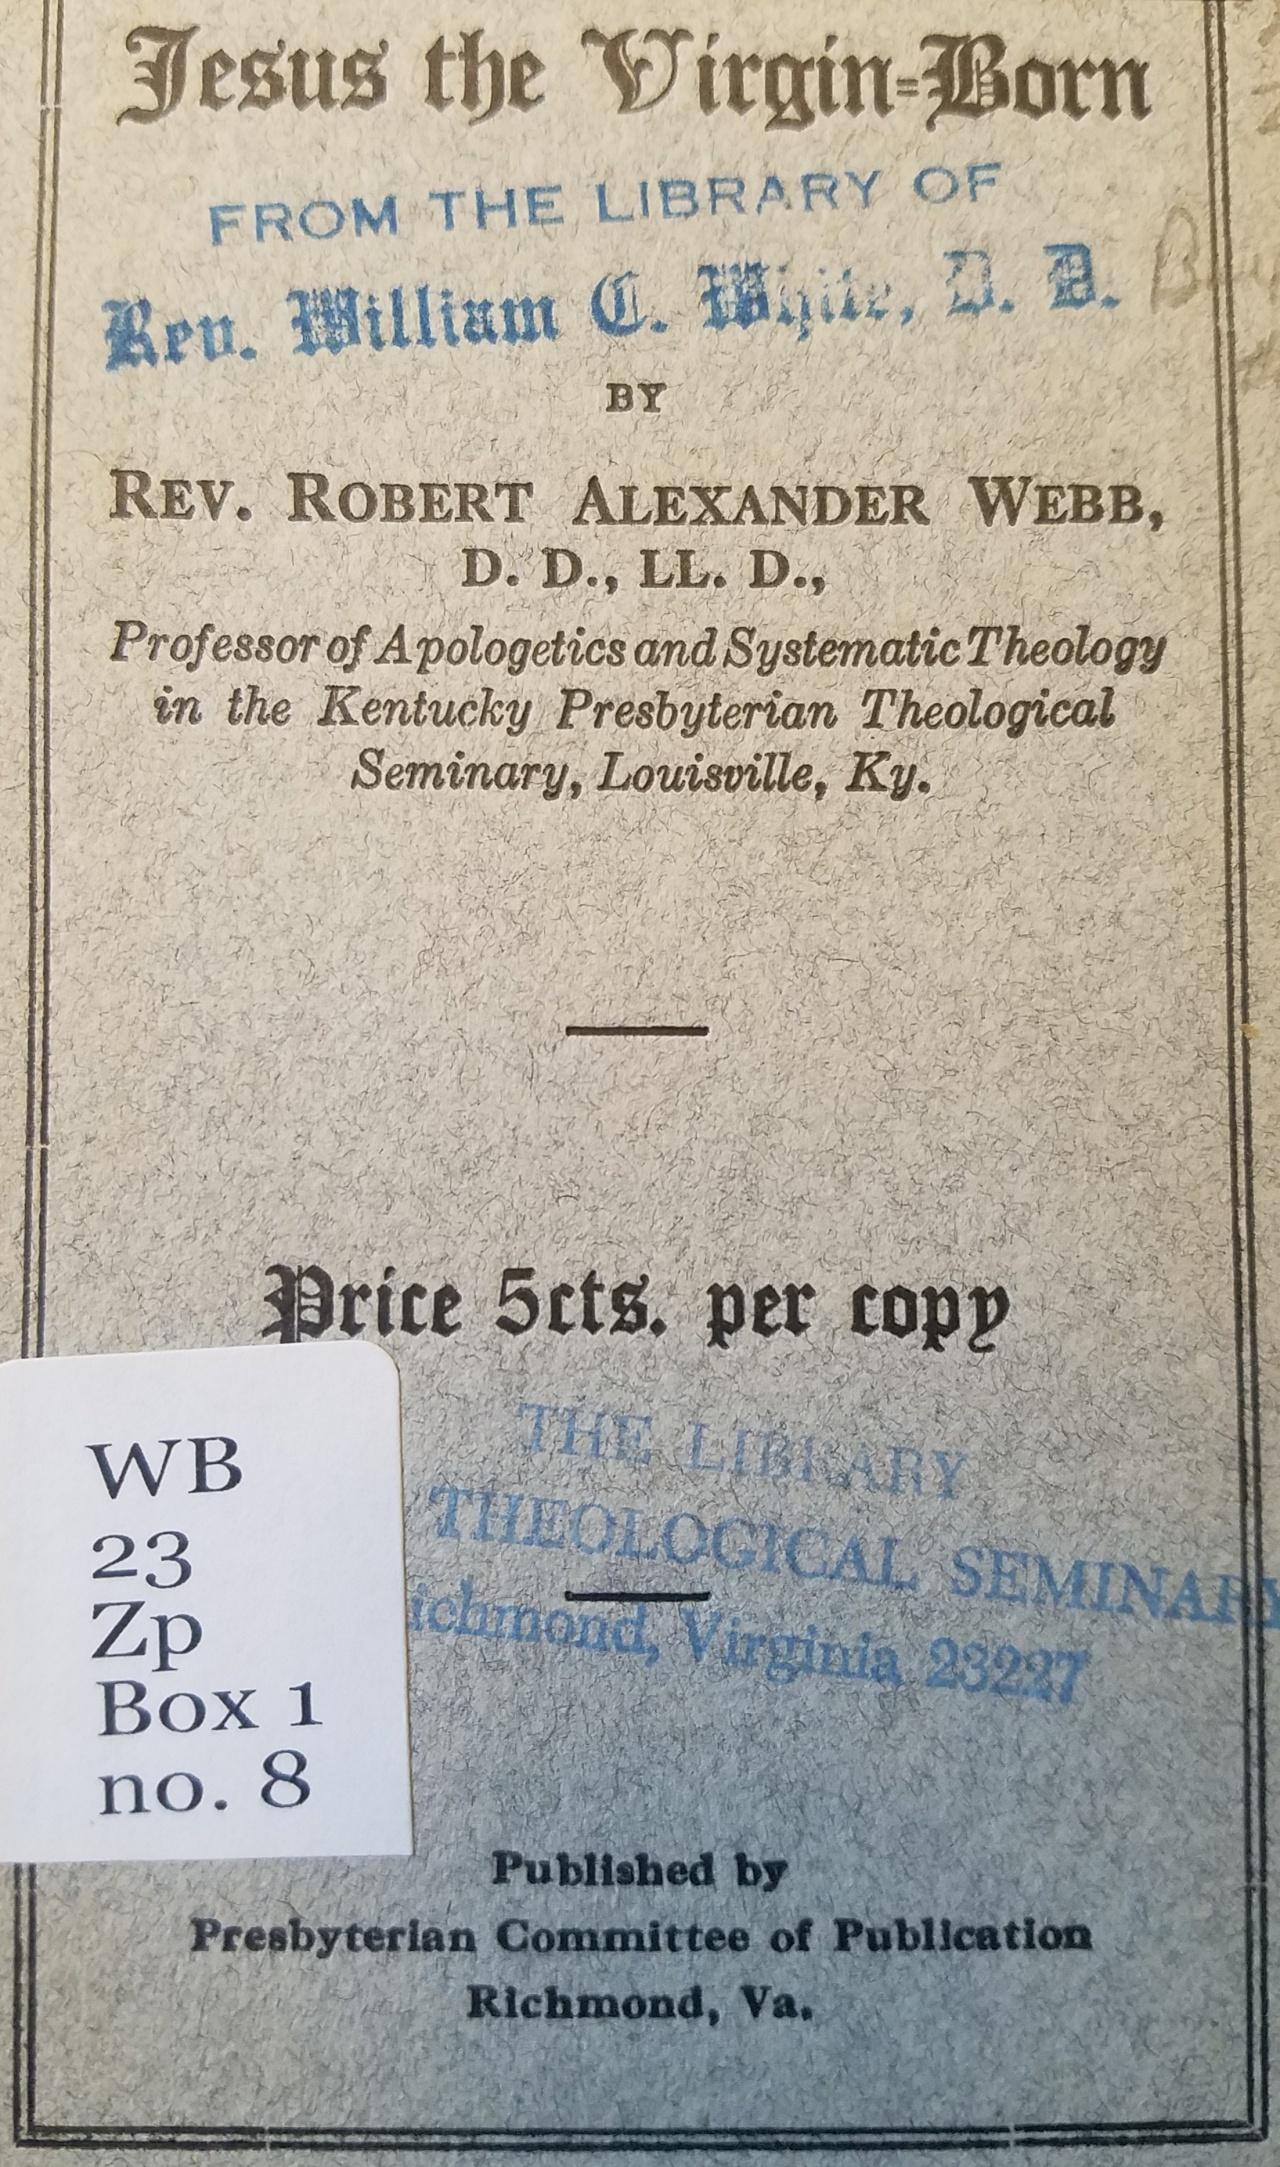 Webb, Robert Alexander, Jesus the Virgin-Born Title Page.jpg